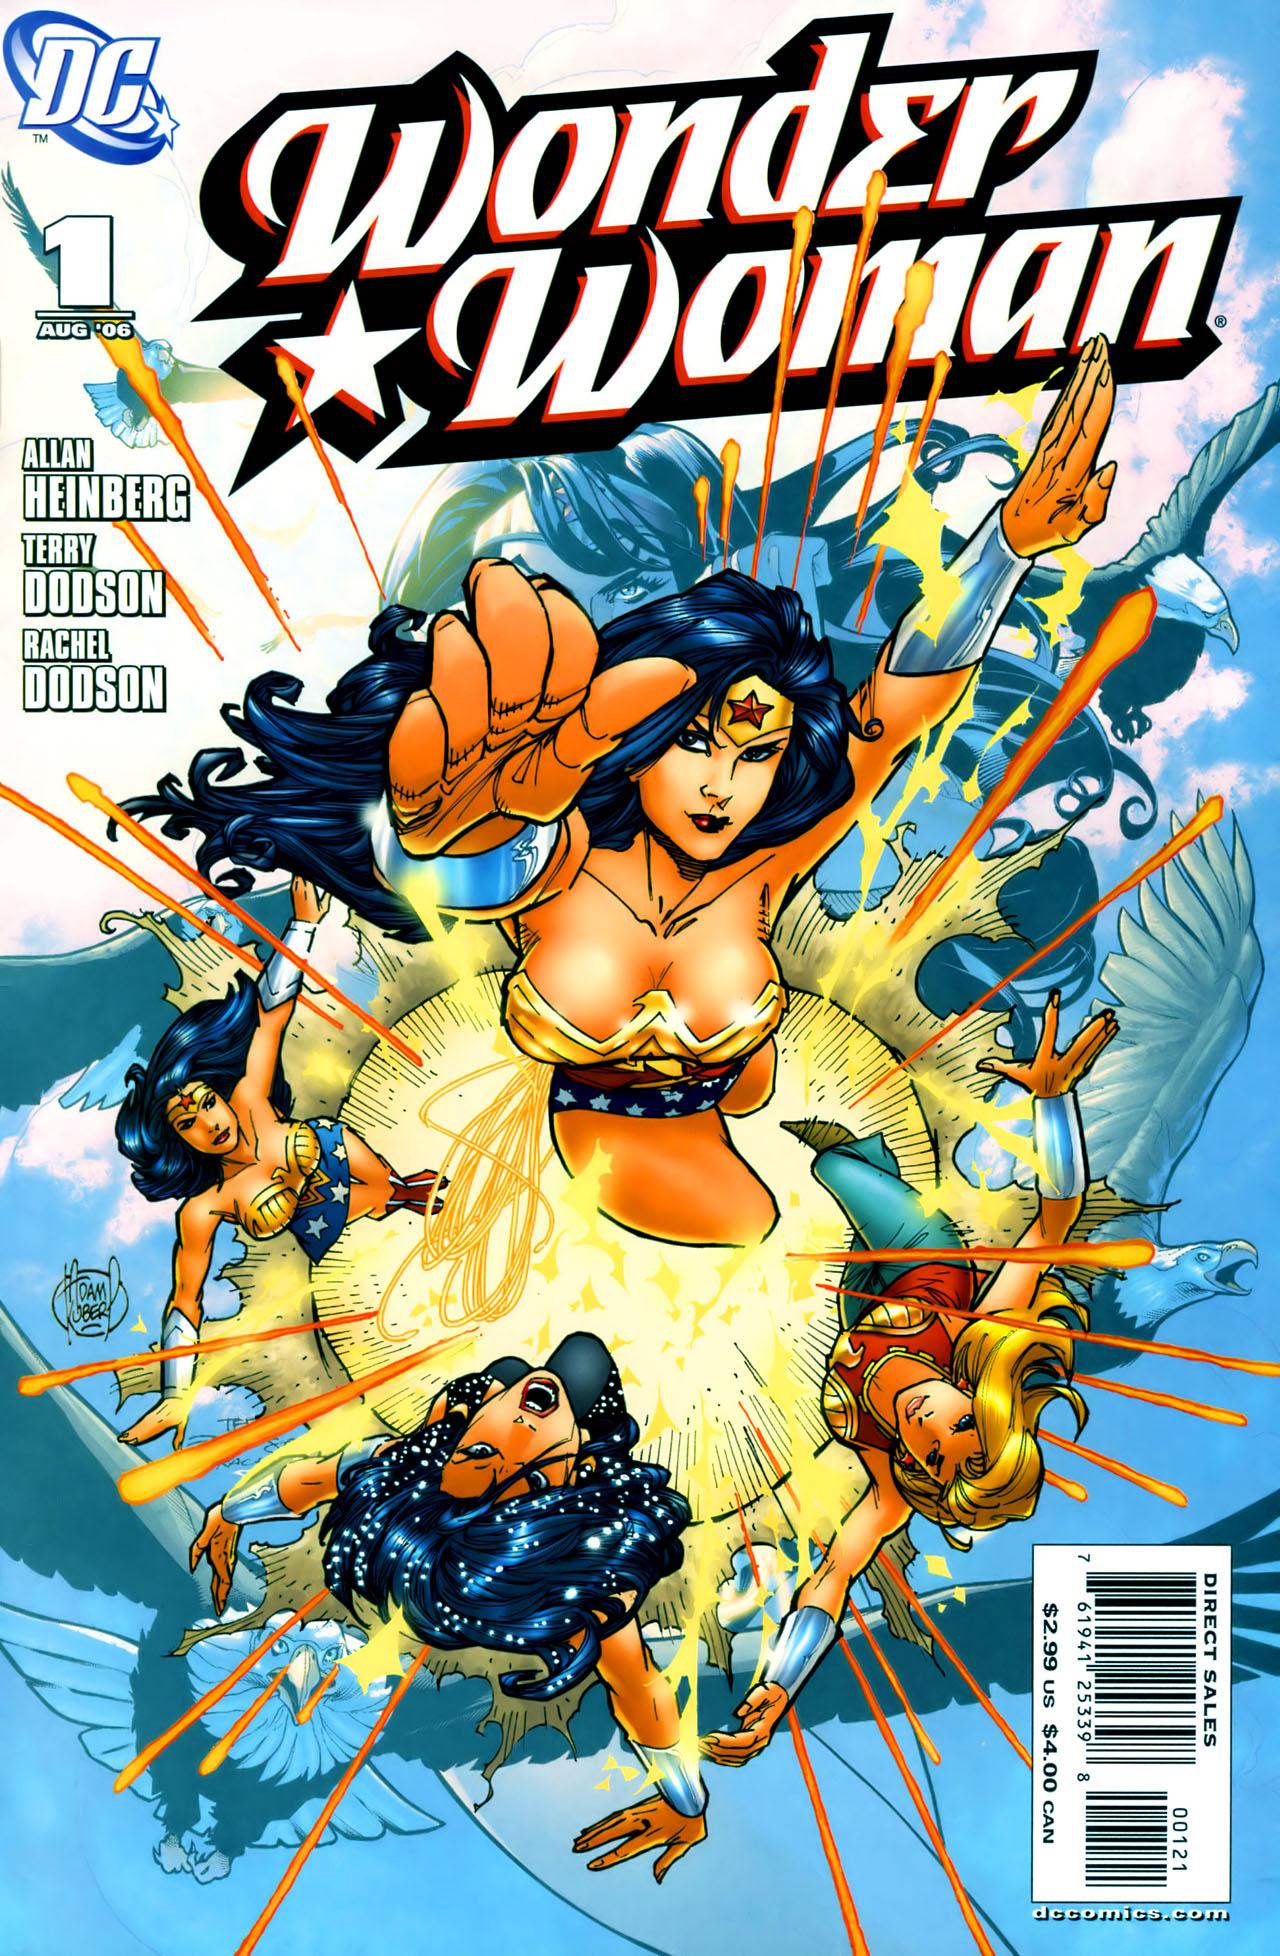 Read online Wonder Woman (2006) comic -  Issue #1 - 2